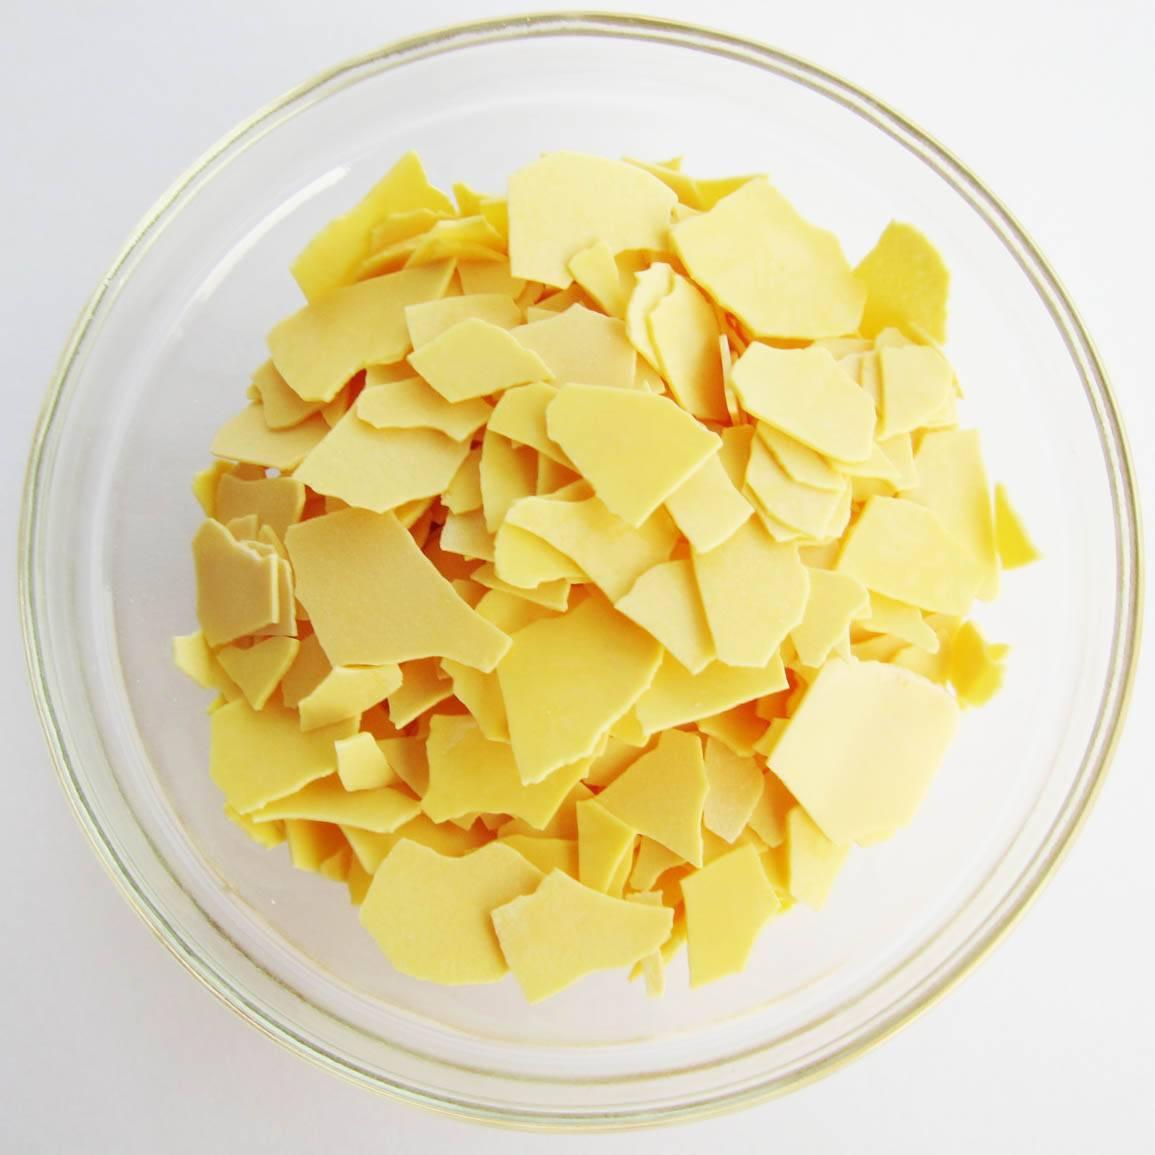 Yellow flakes 60% sodium sulphide